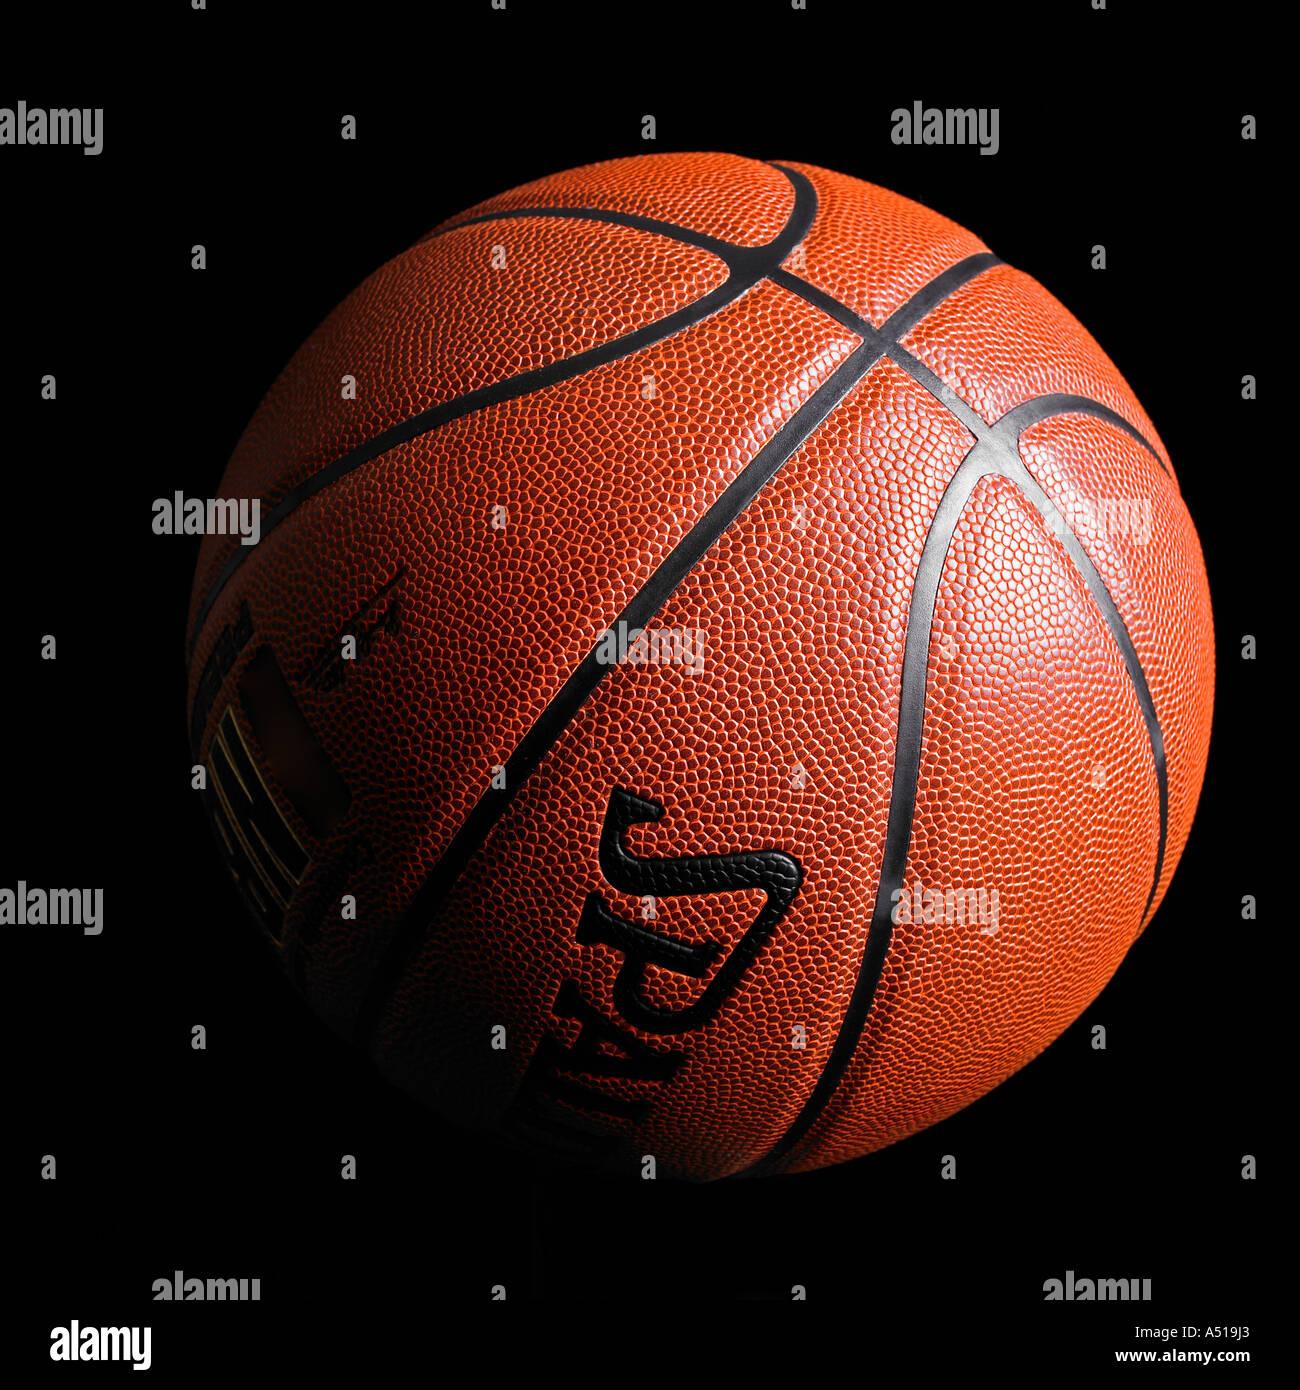 baketball live